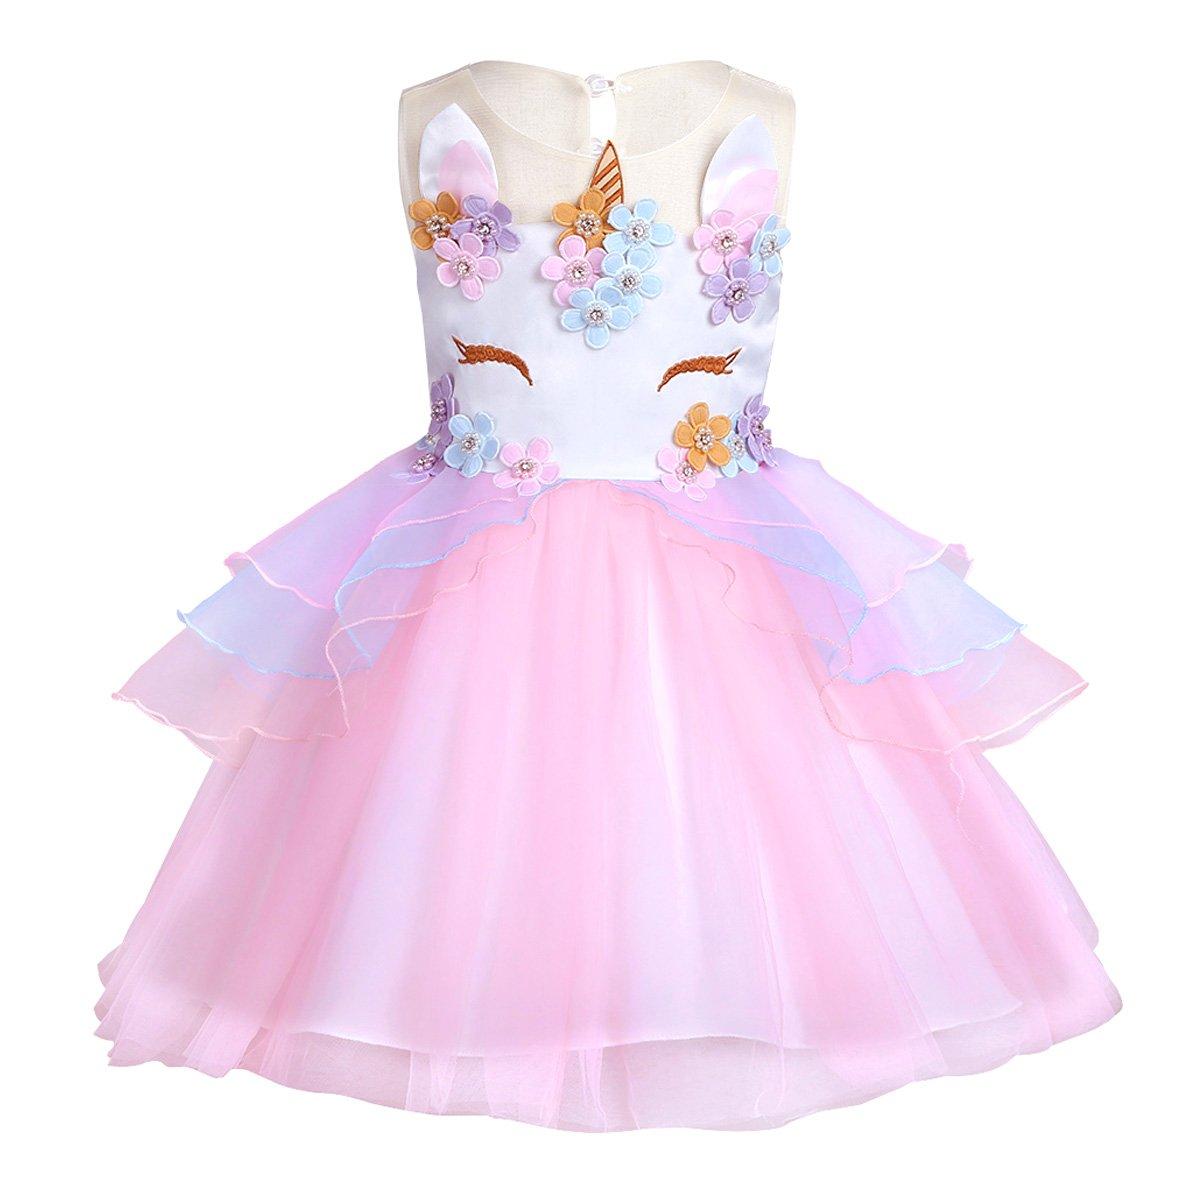 TiaoBug Baby Girls Flower Splice Cartoon Costume Cosplay Princess Dress Up Dance Outfits Pink 6-9 Months